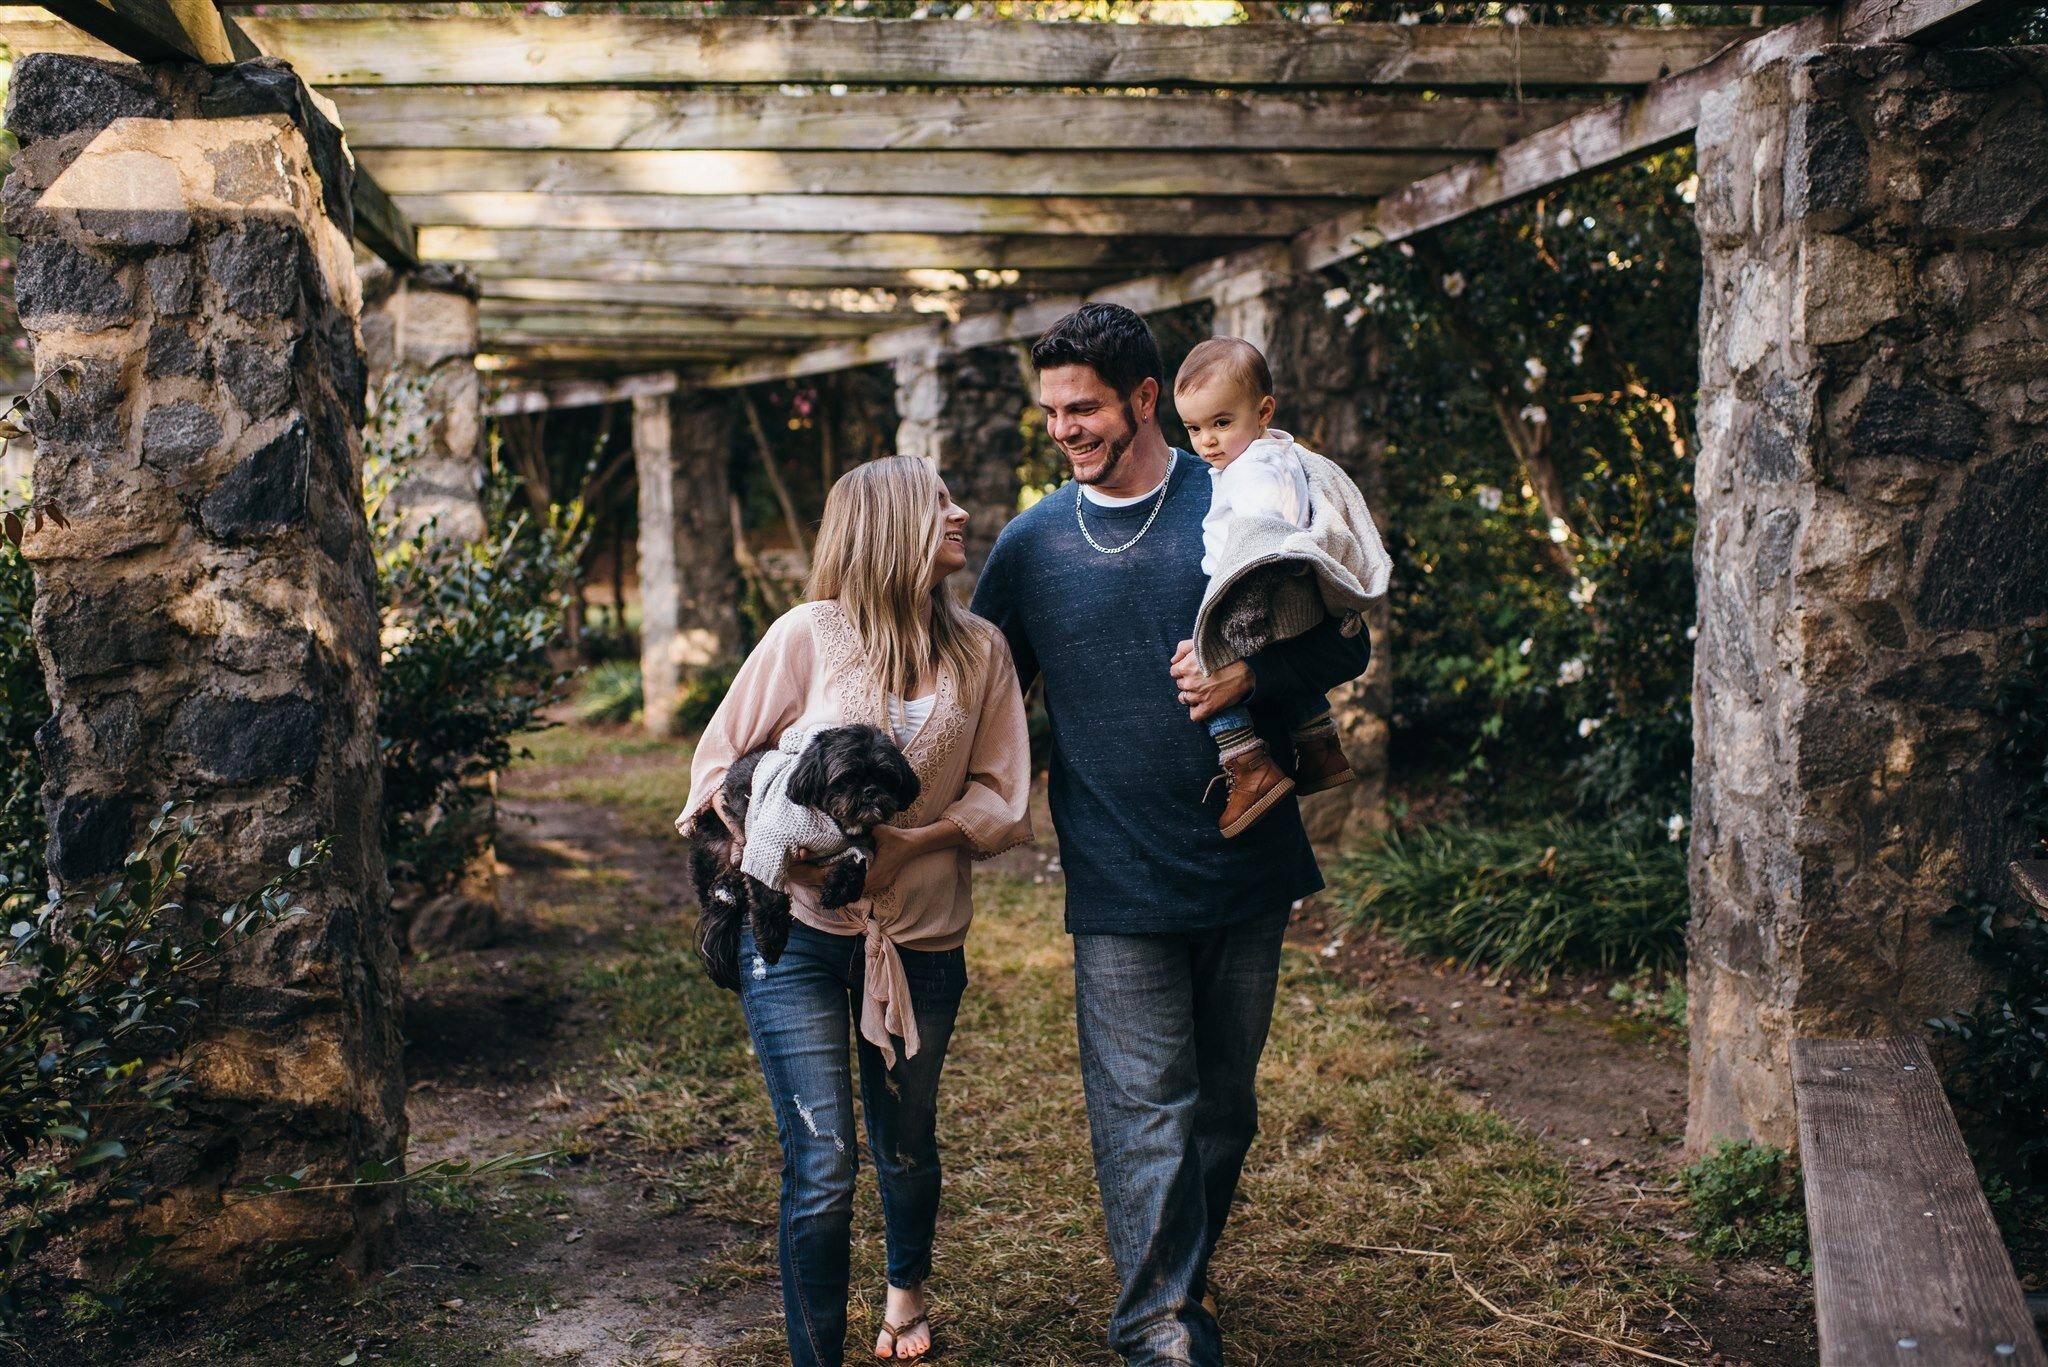 Raleigh Family Photographer - North Carolina Family Photographer - Raleigh Rose Garden Family Session